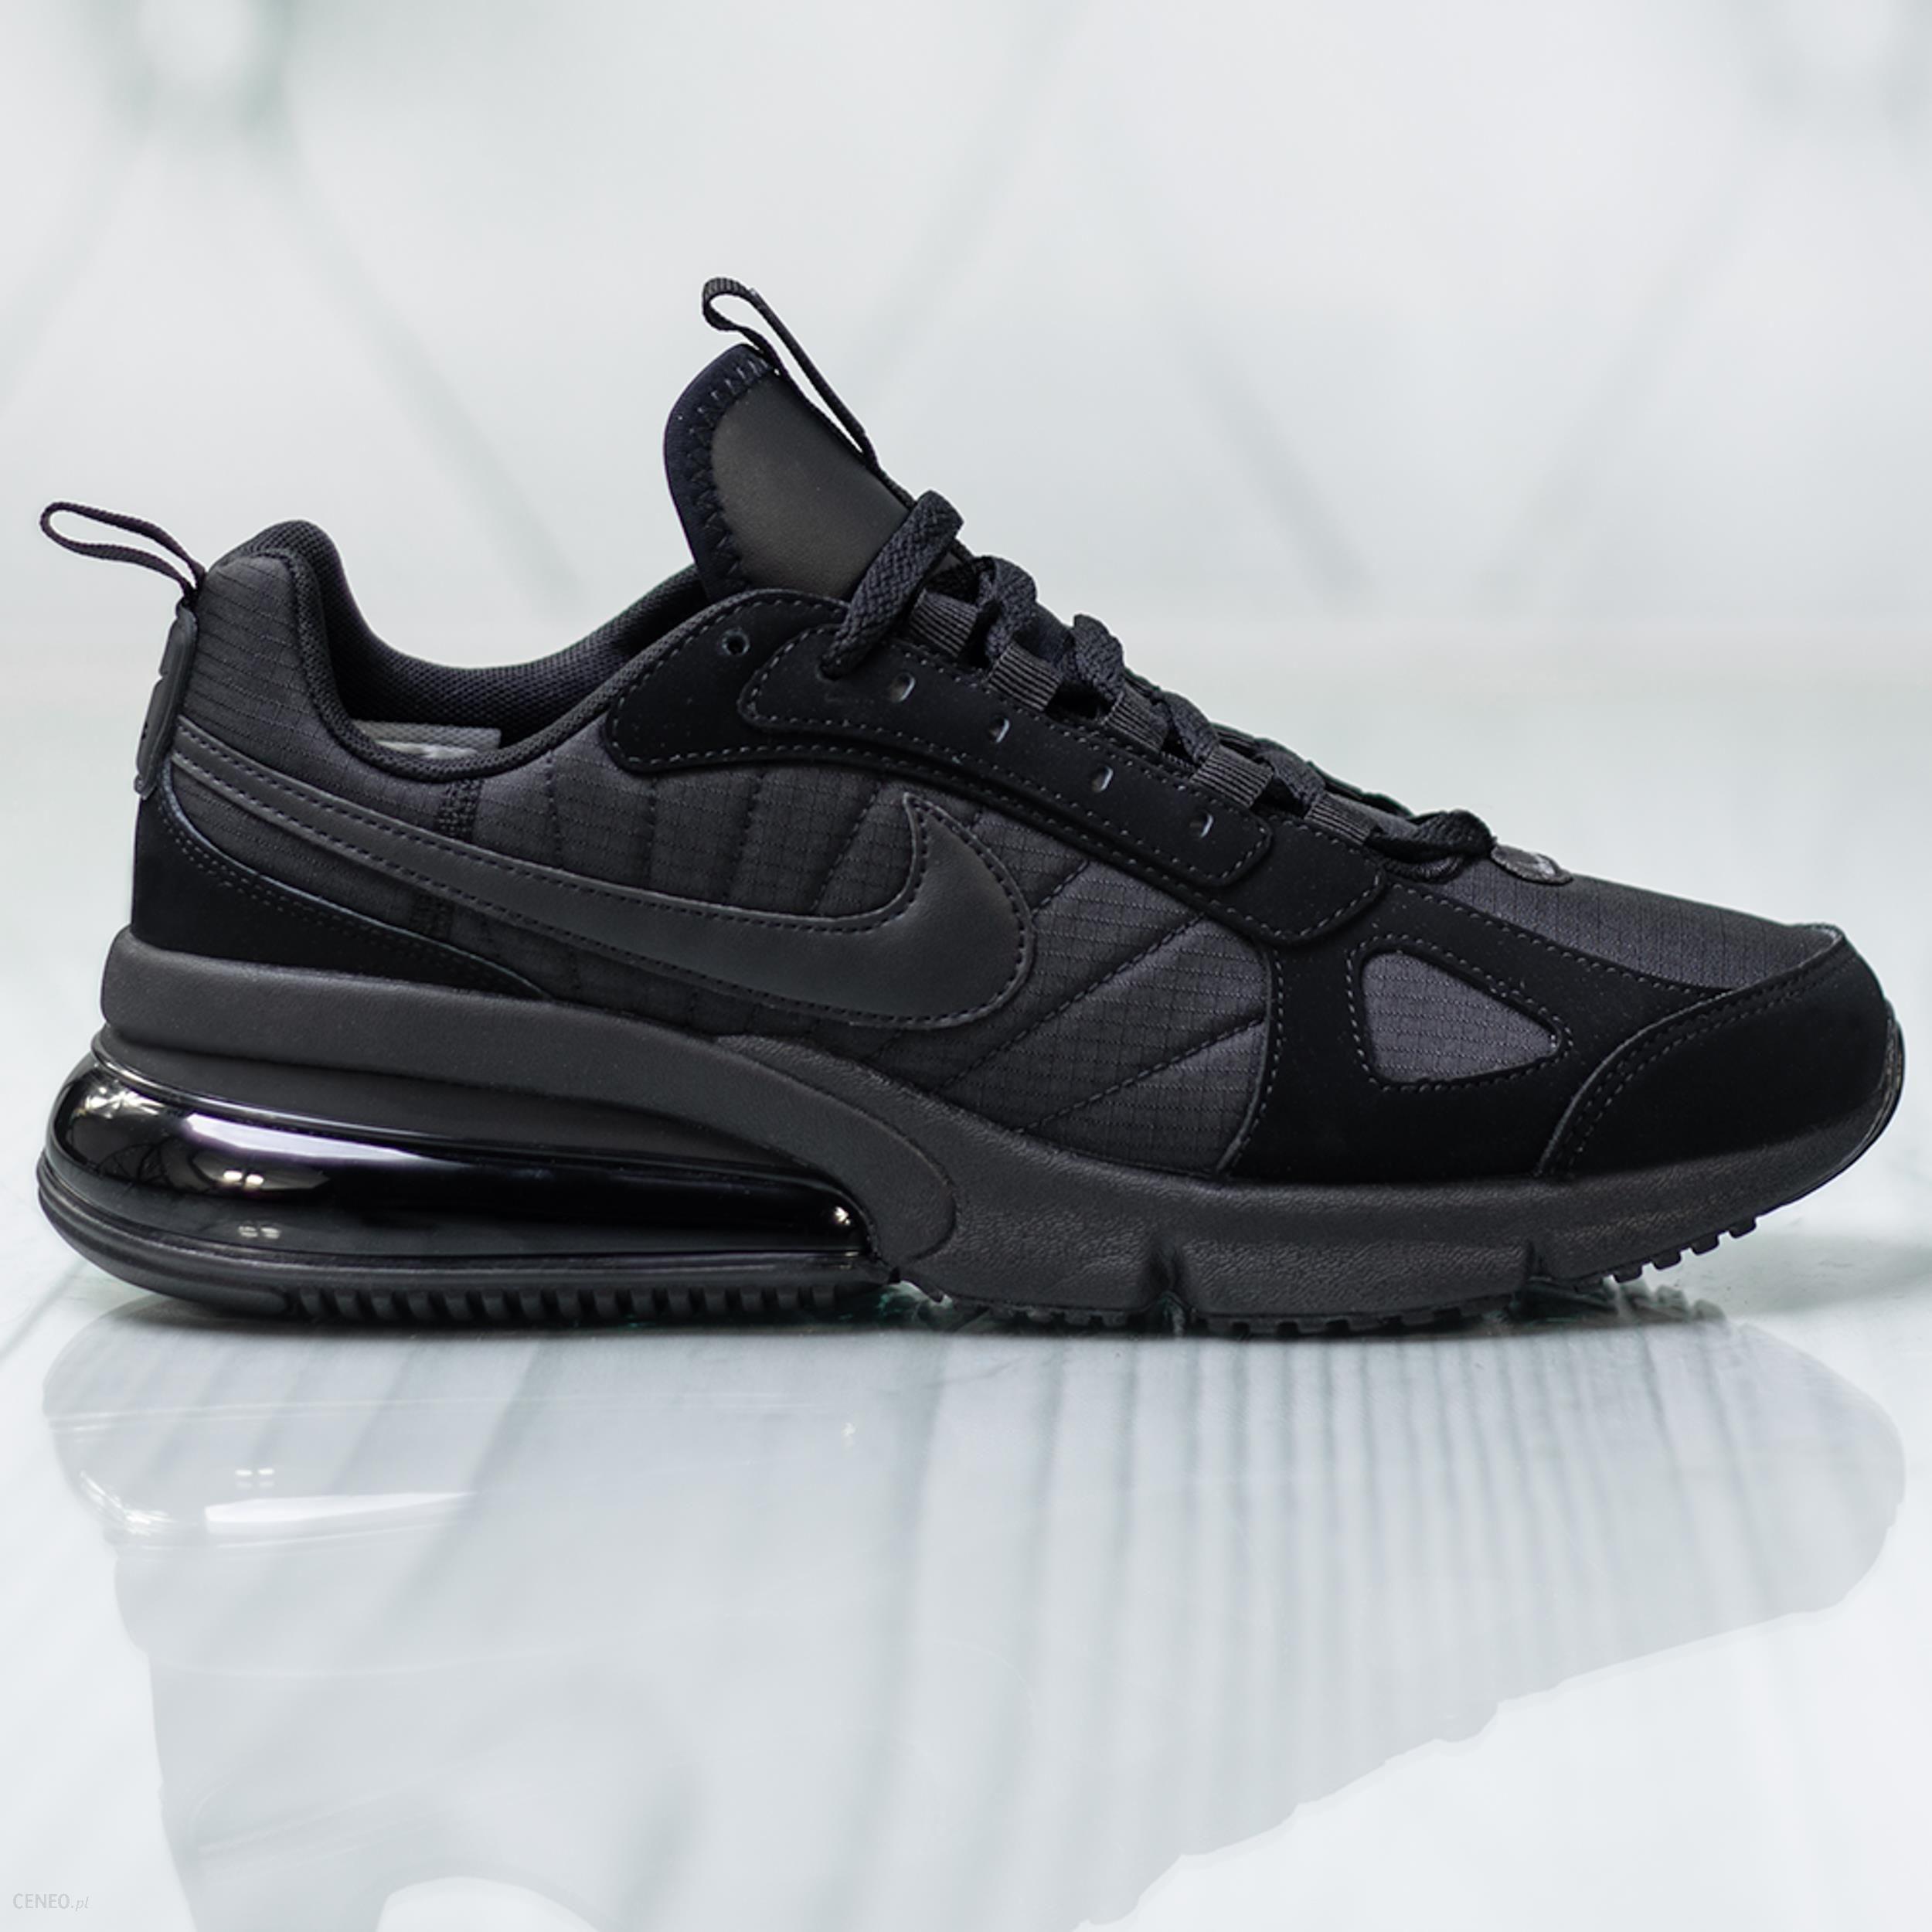 Buty Nike Air Max 270 005 New eRunner